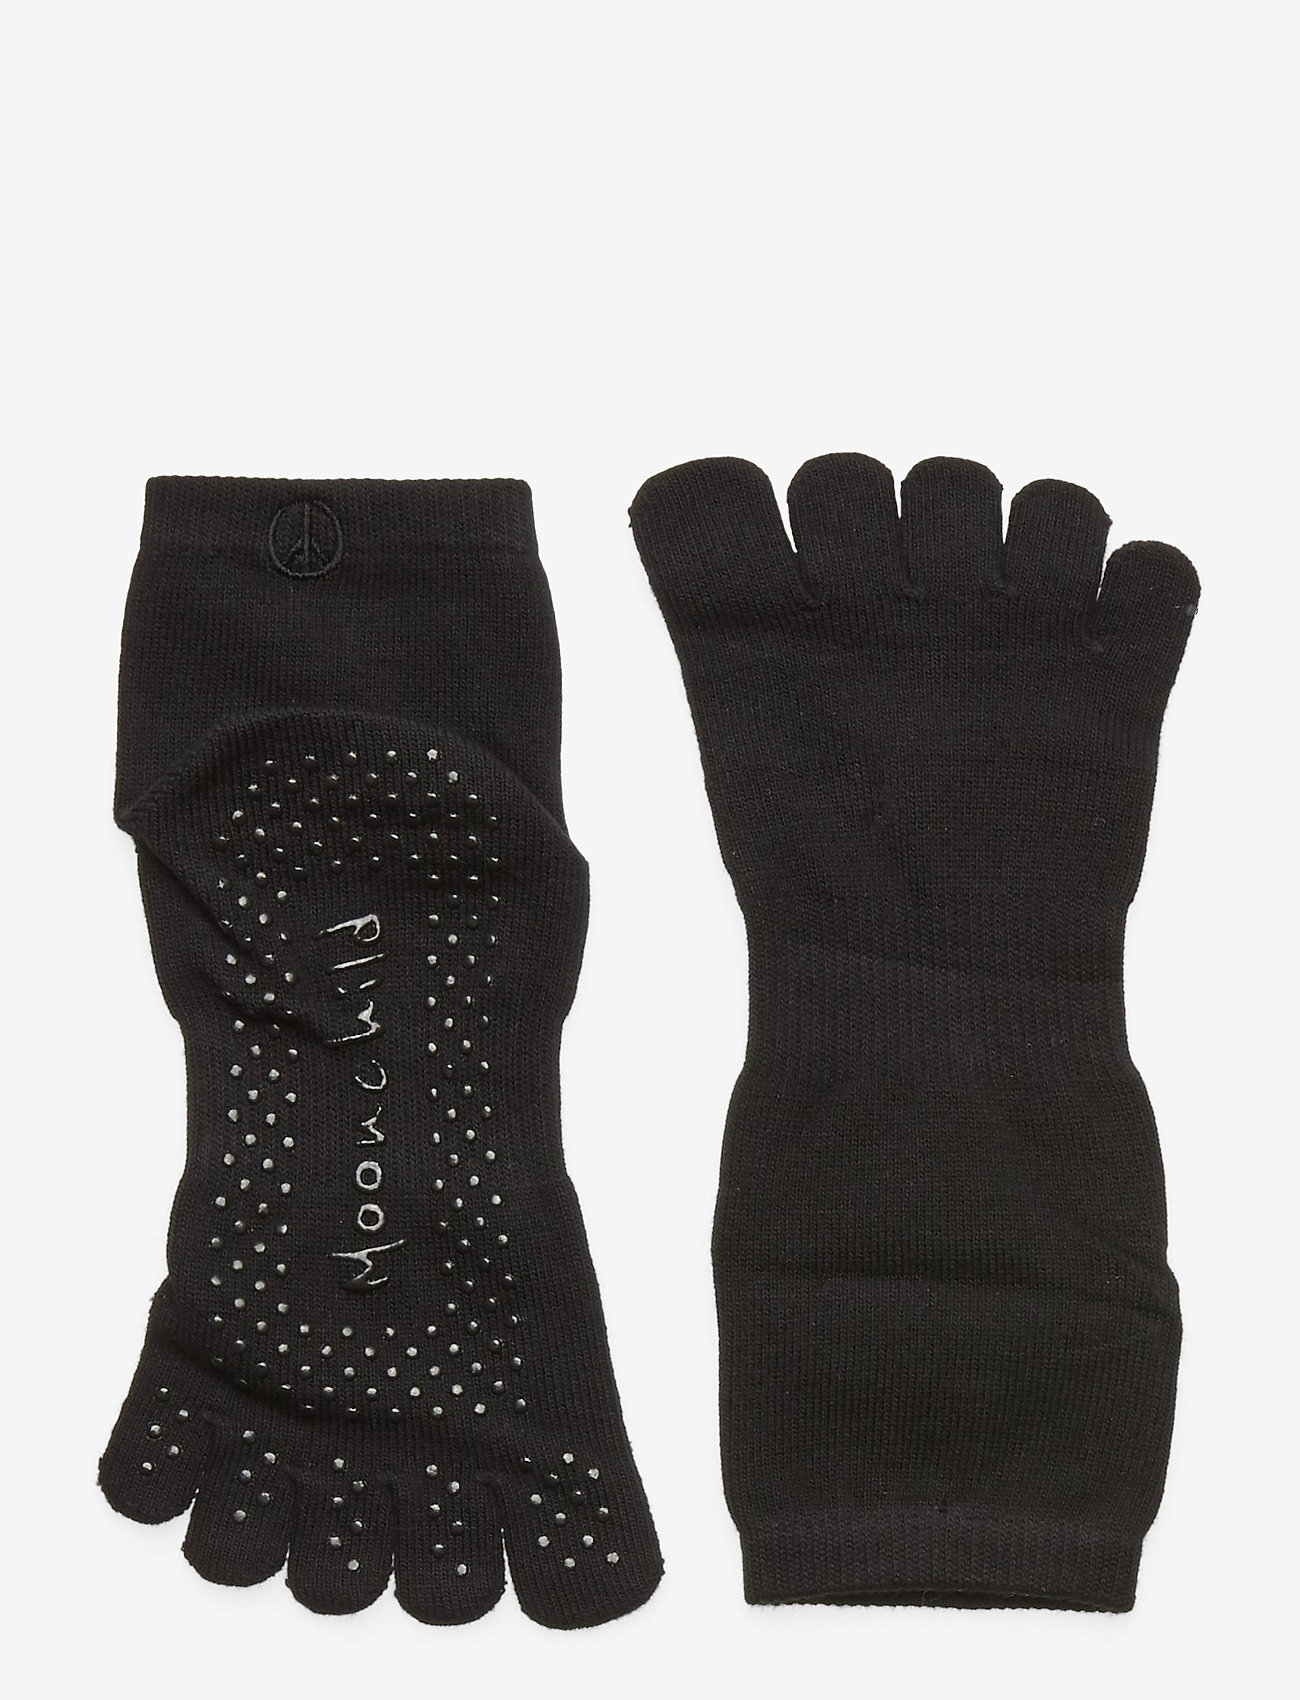 Moonchild Yoga Wear - Moonchild Grip Socks - High - yogamatten & uitrusting - onyx black - 1